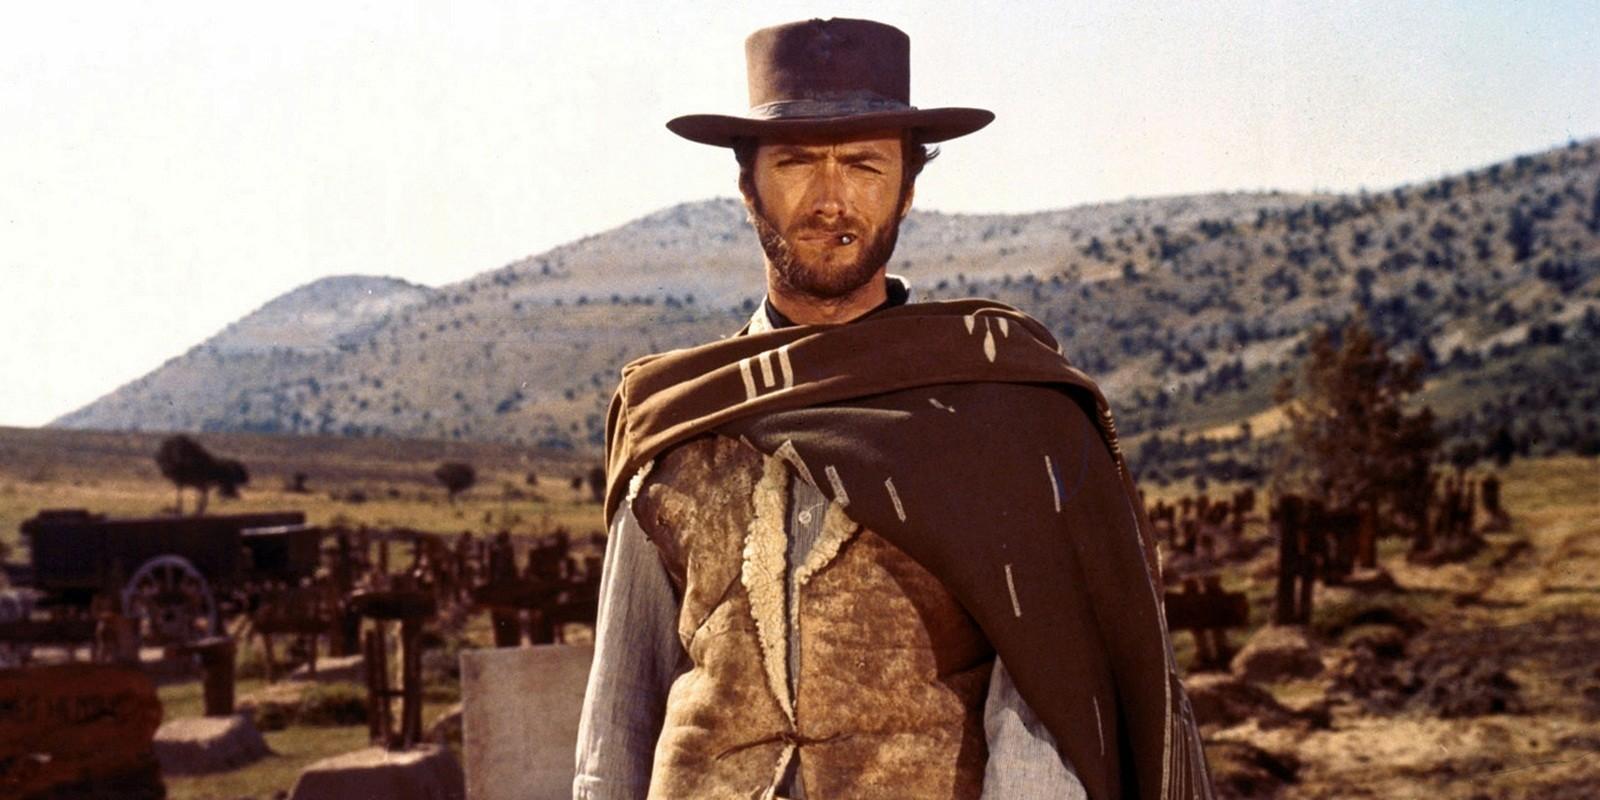 Clint-Eastwood-wallpaper-e1433172213385